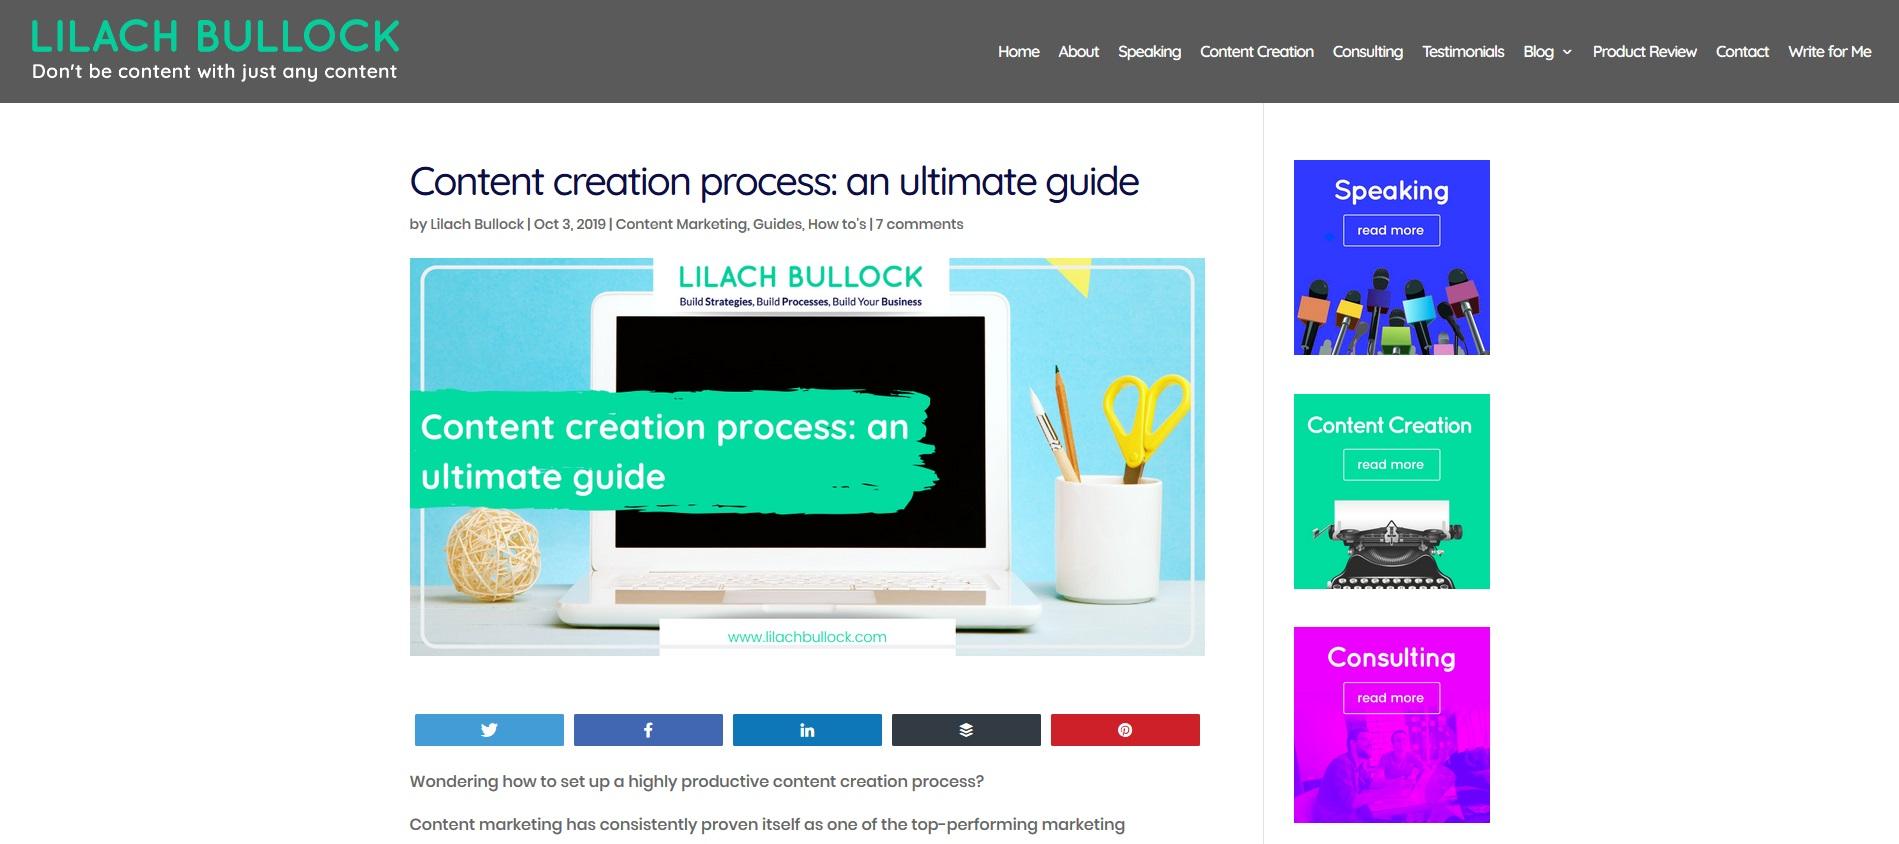 lilach bullock ultimate guide